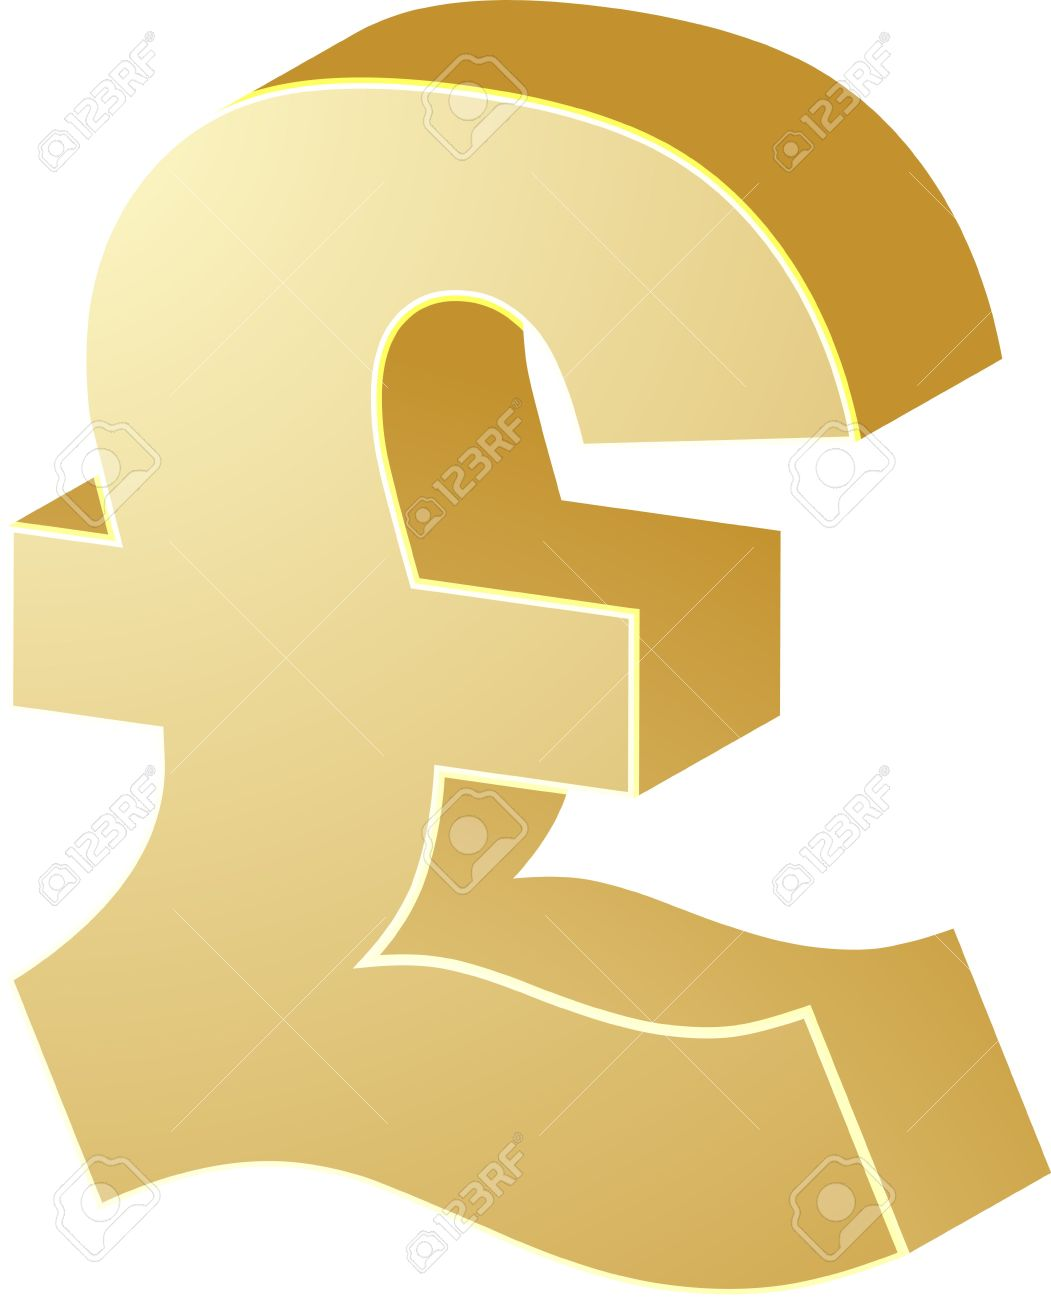 English cash clipart.